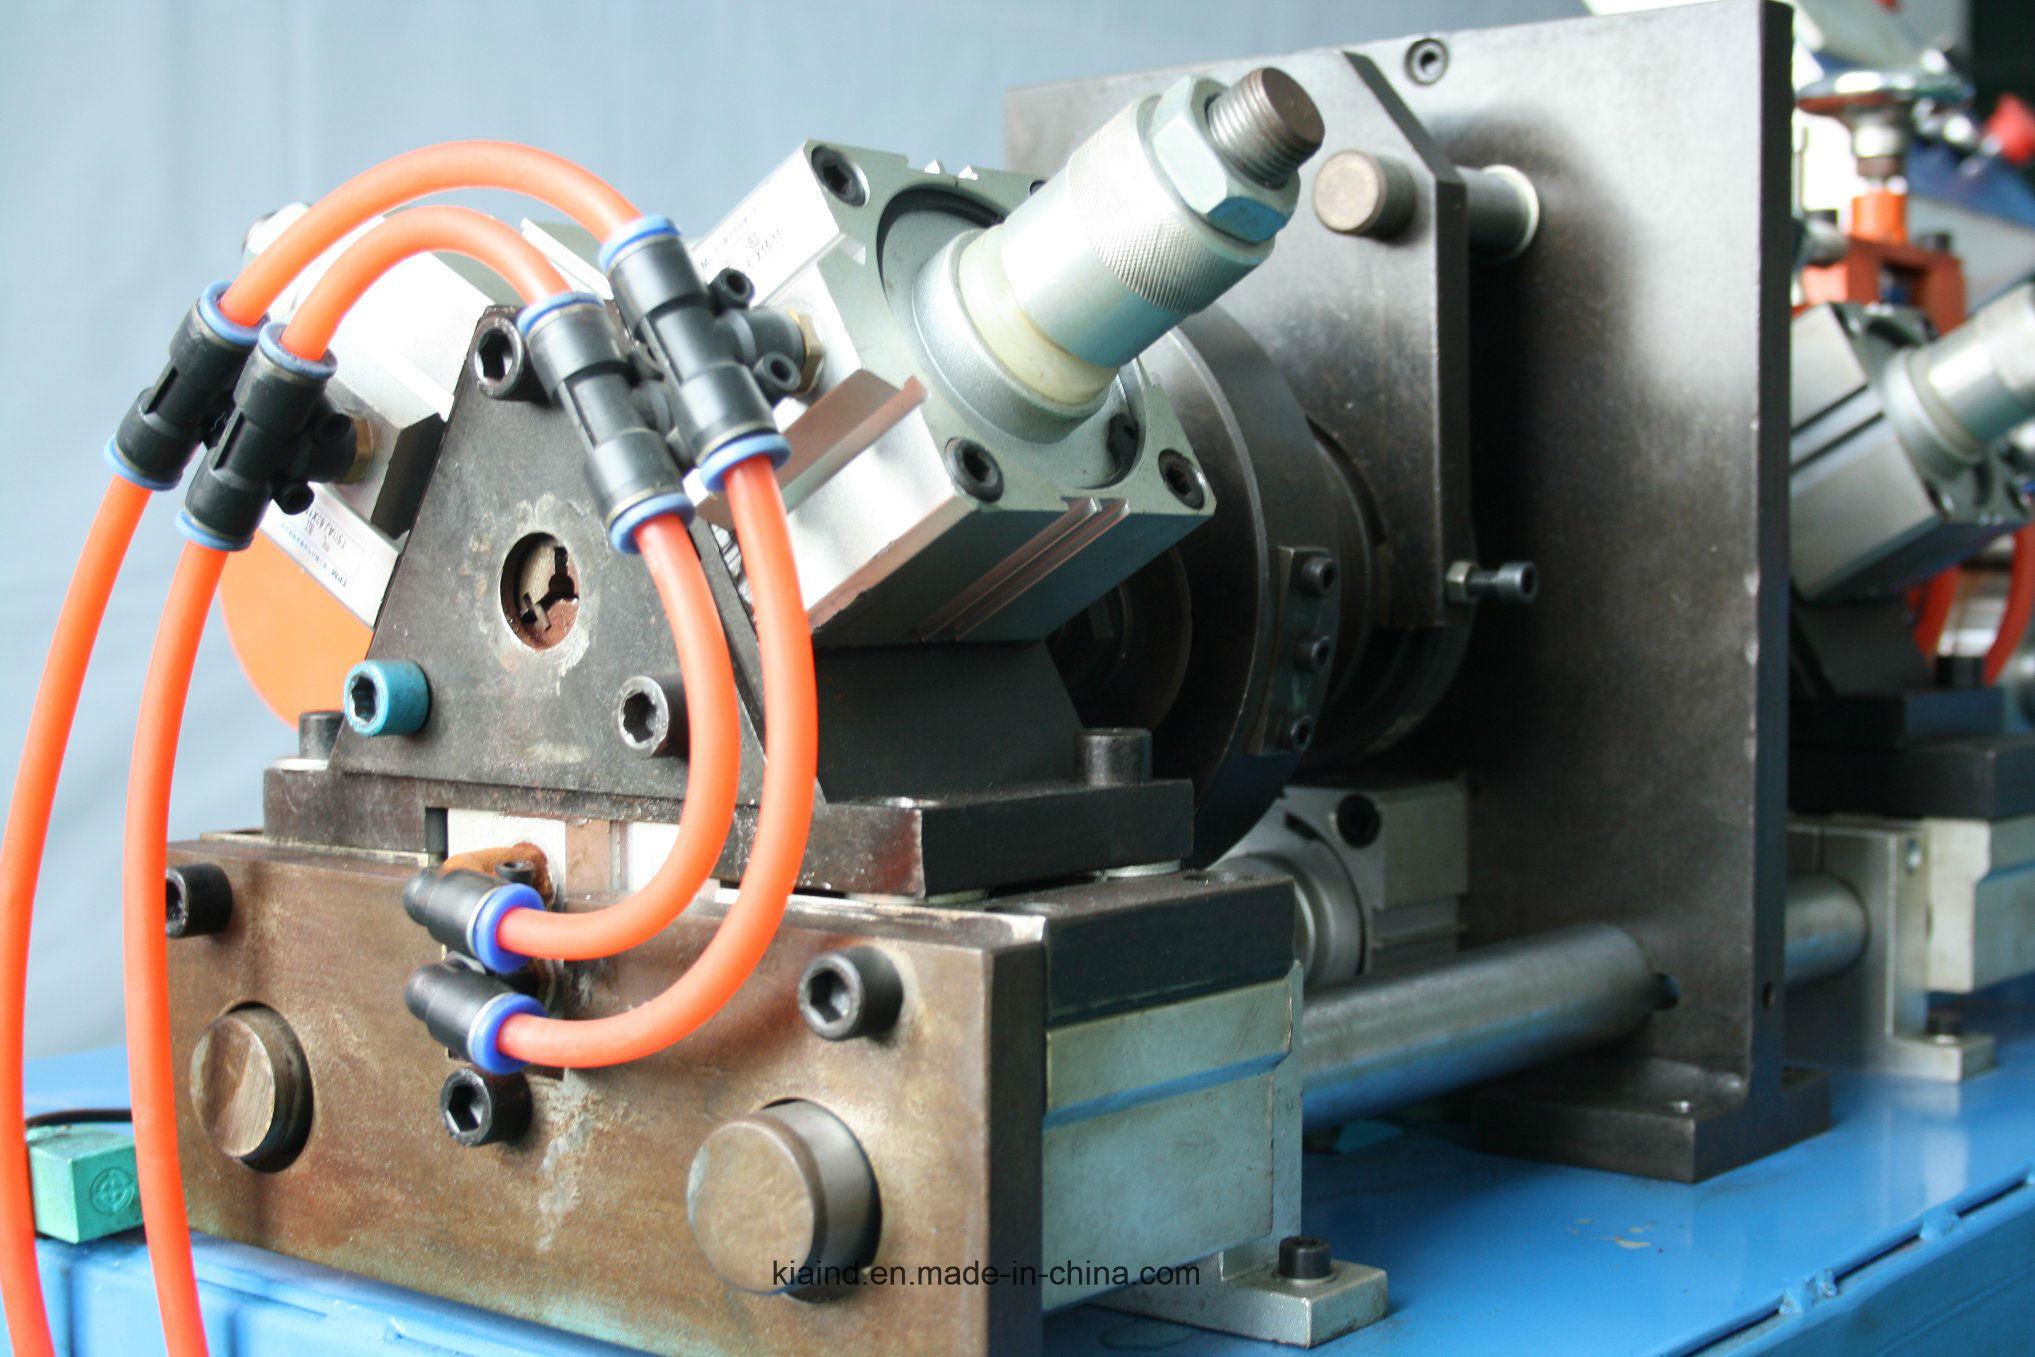 Automatic Tube Straightening and Cutting Machine